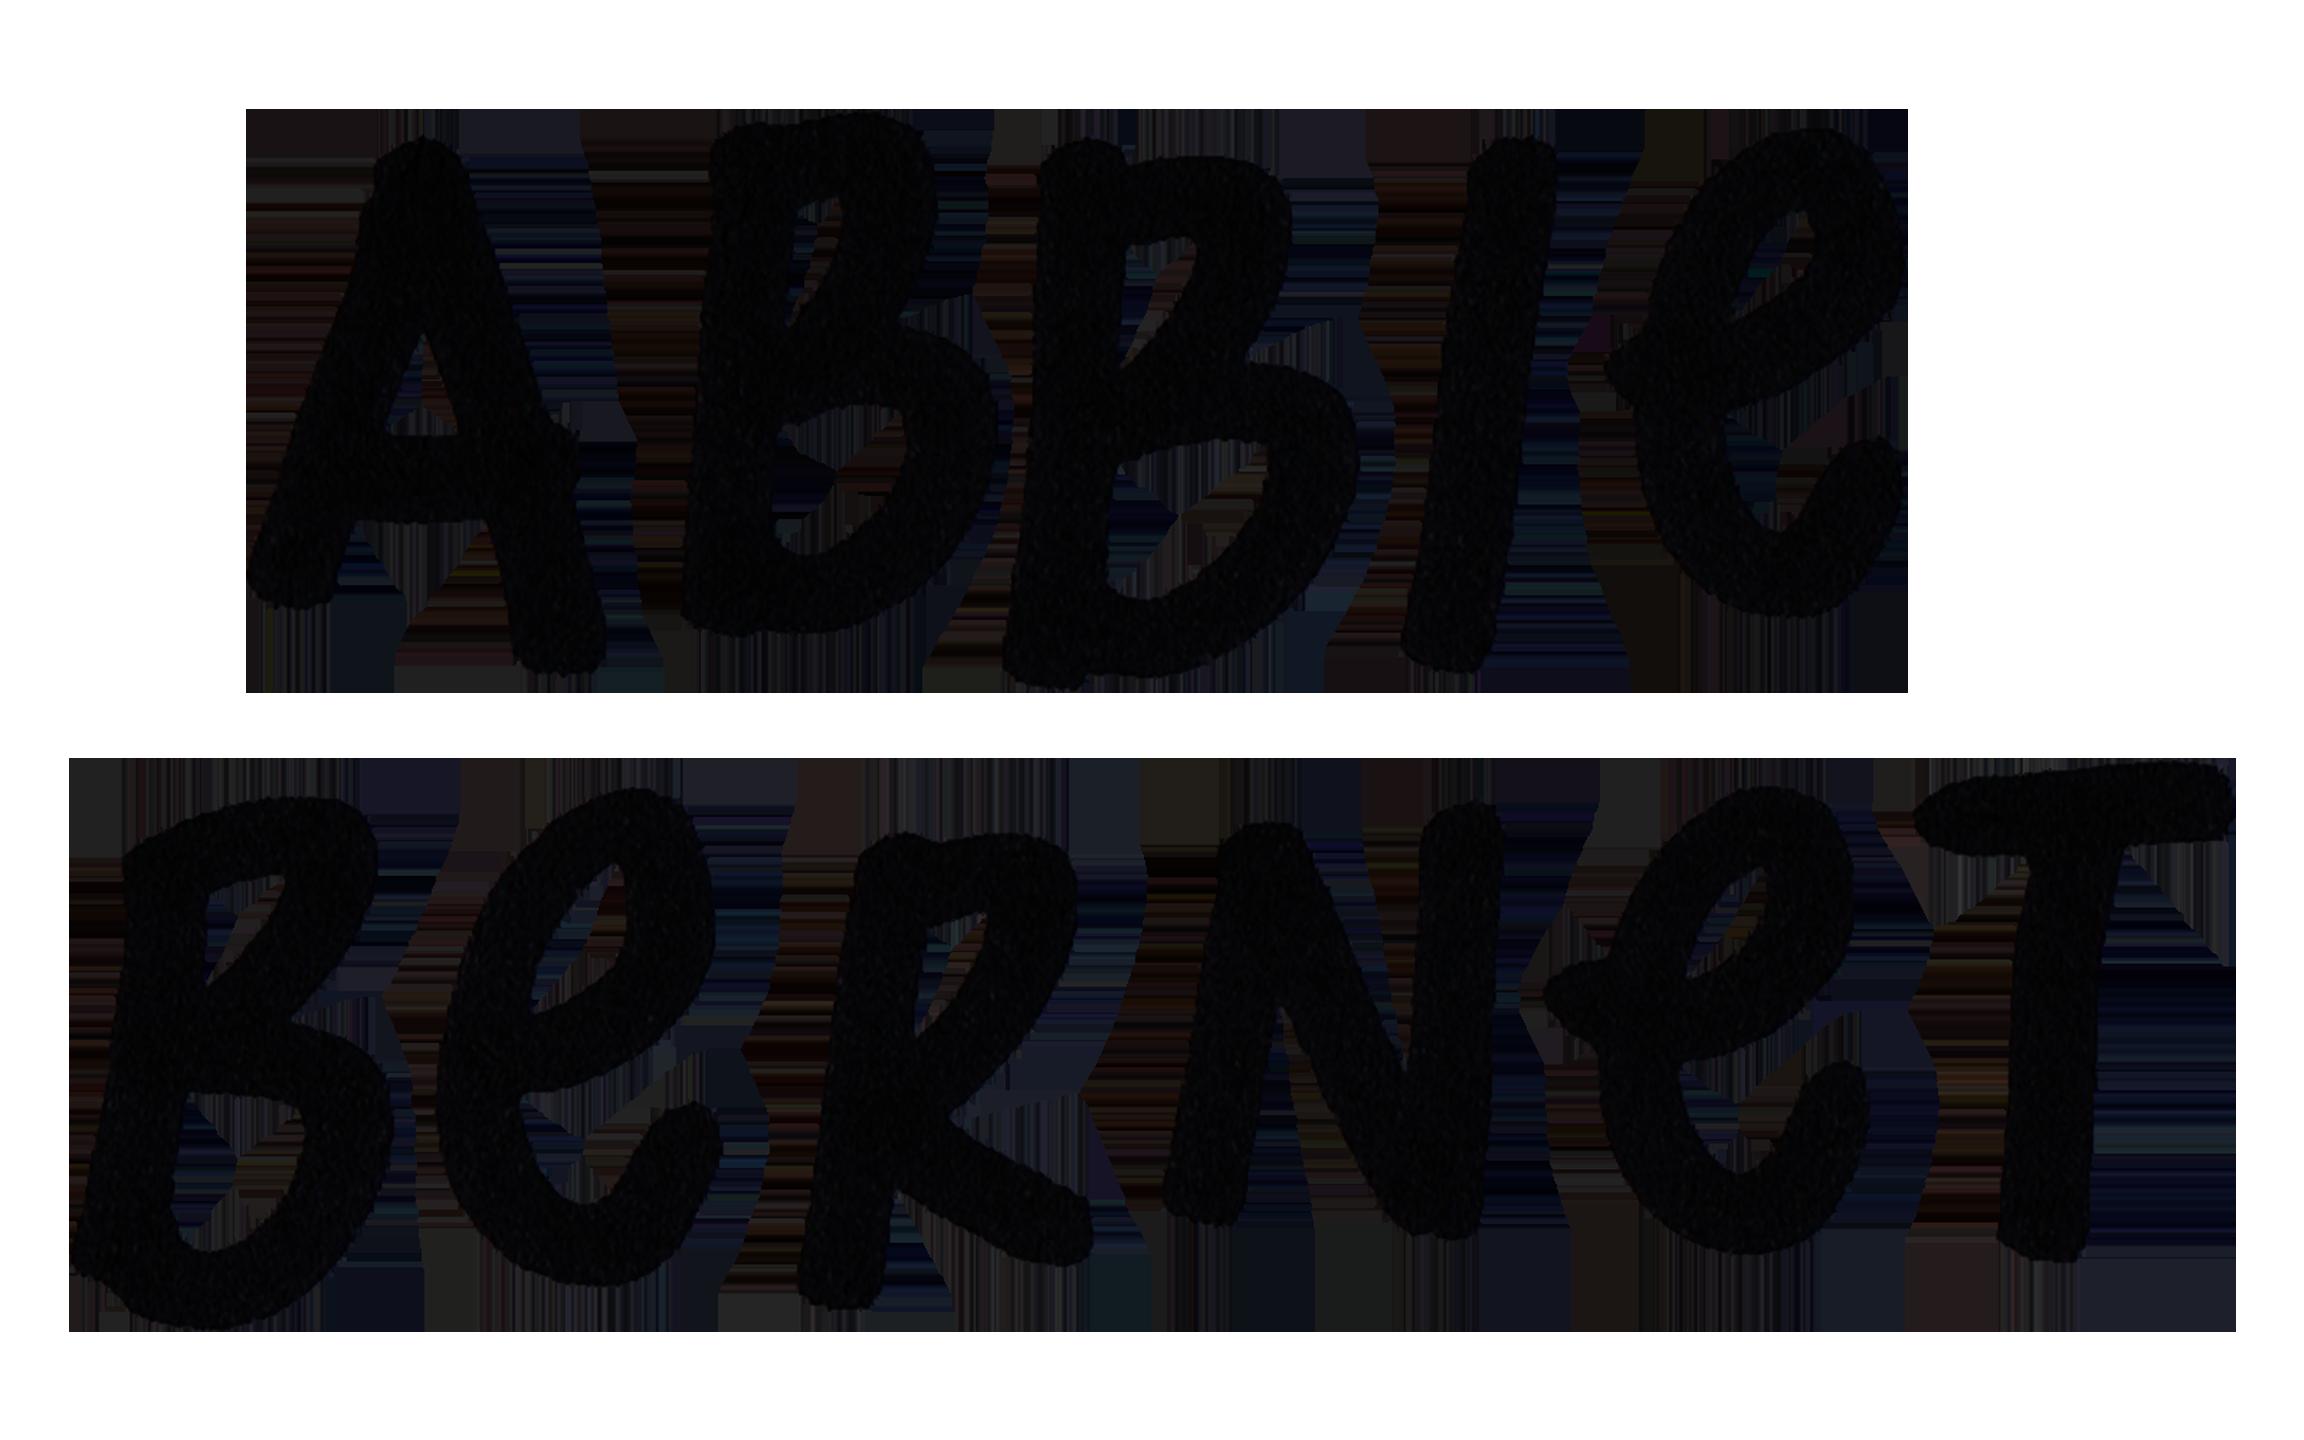 Abbie Bernet